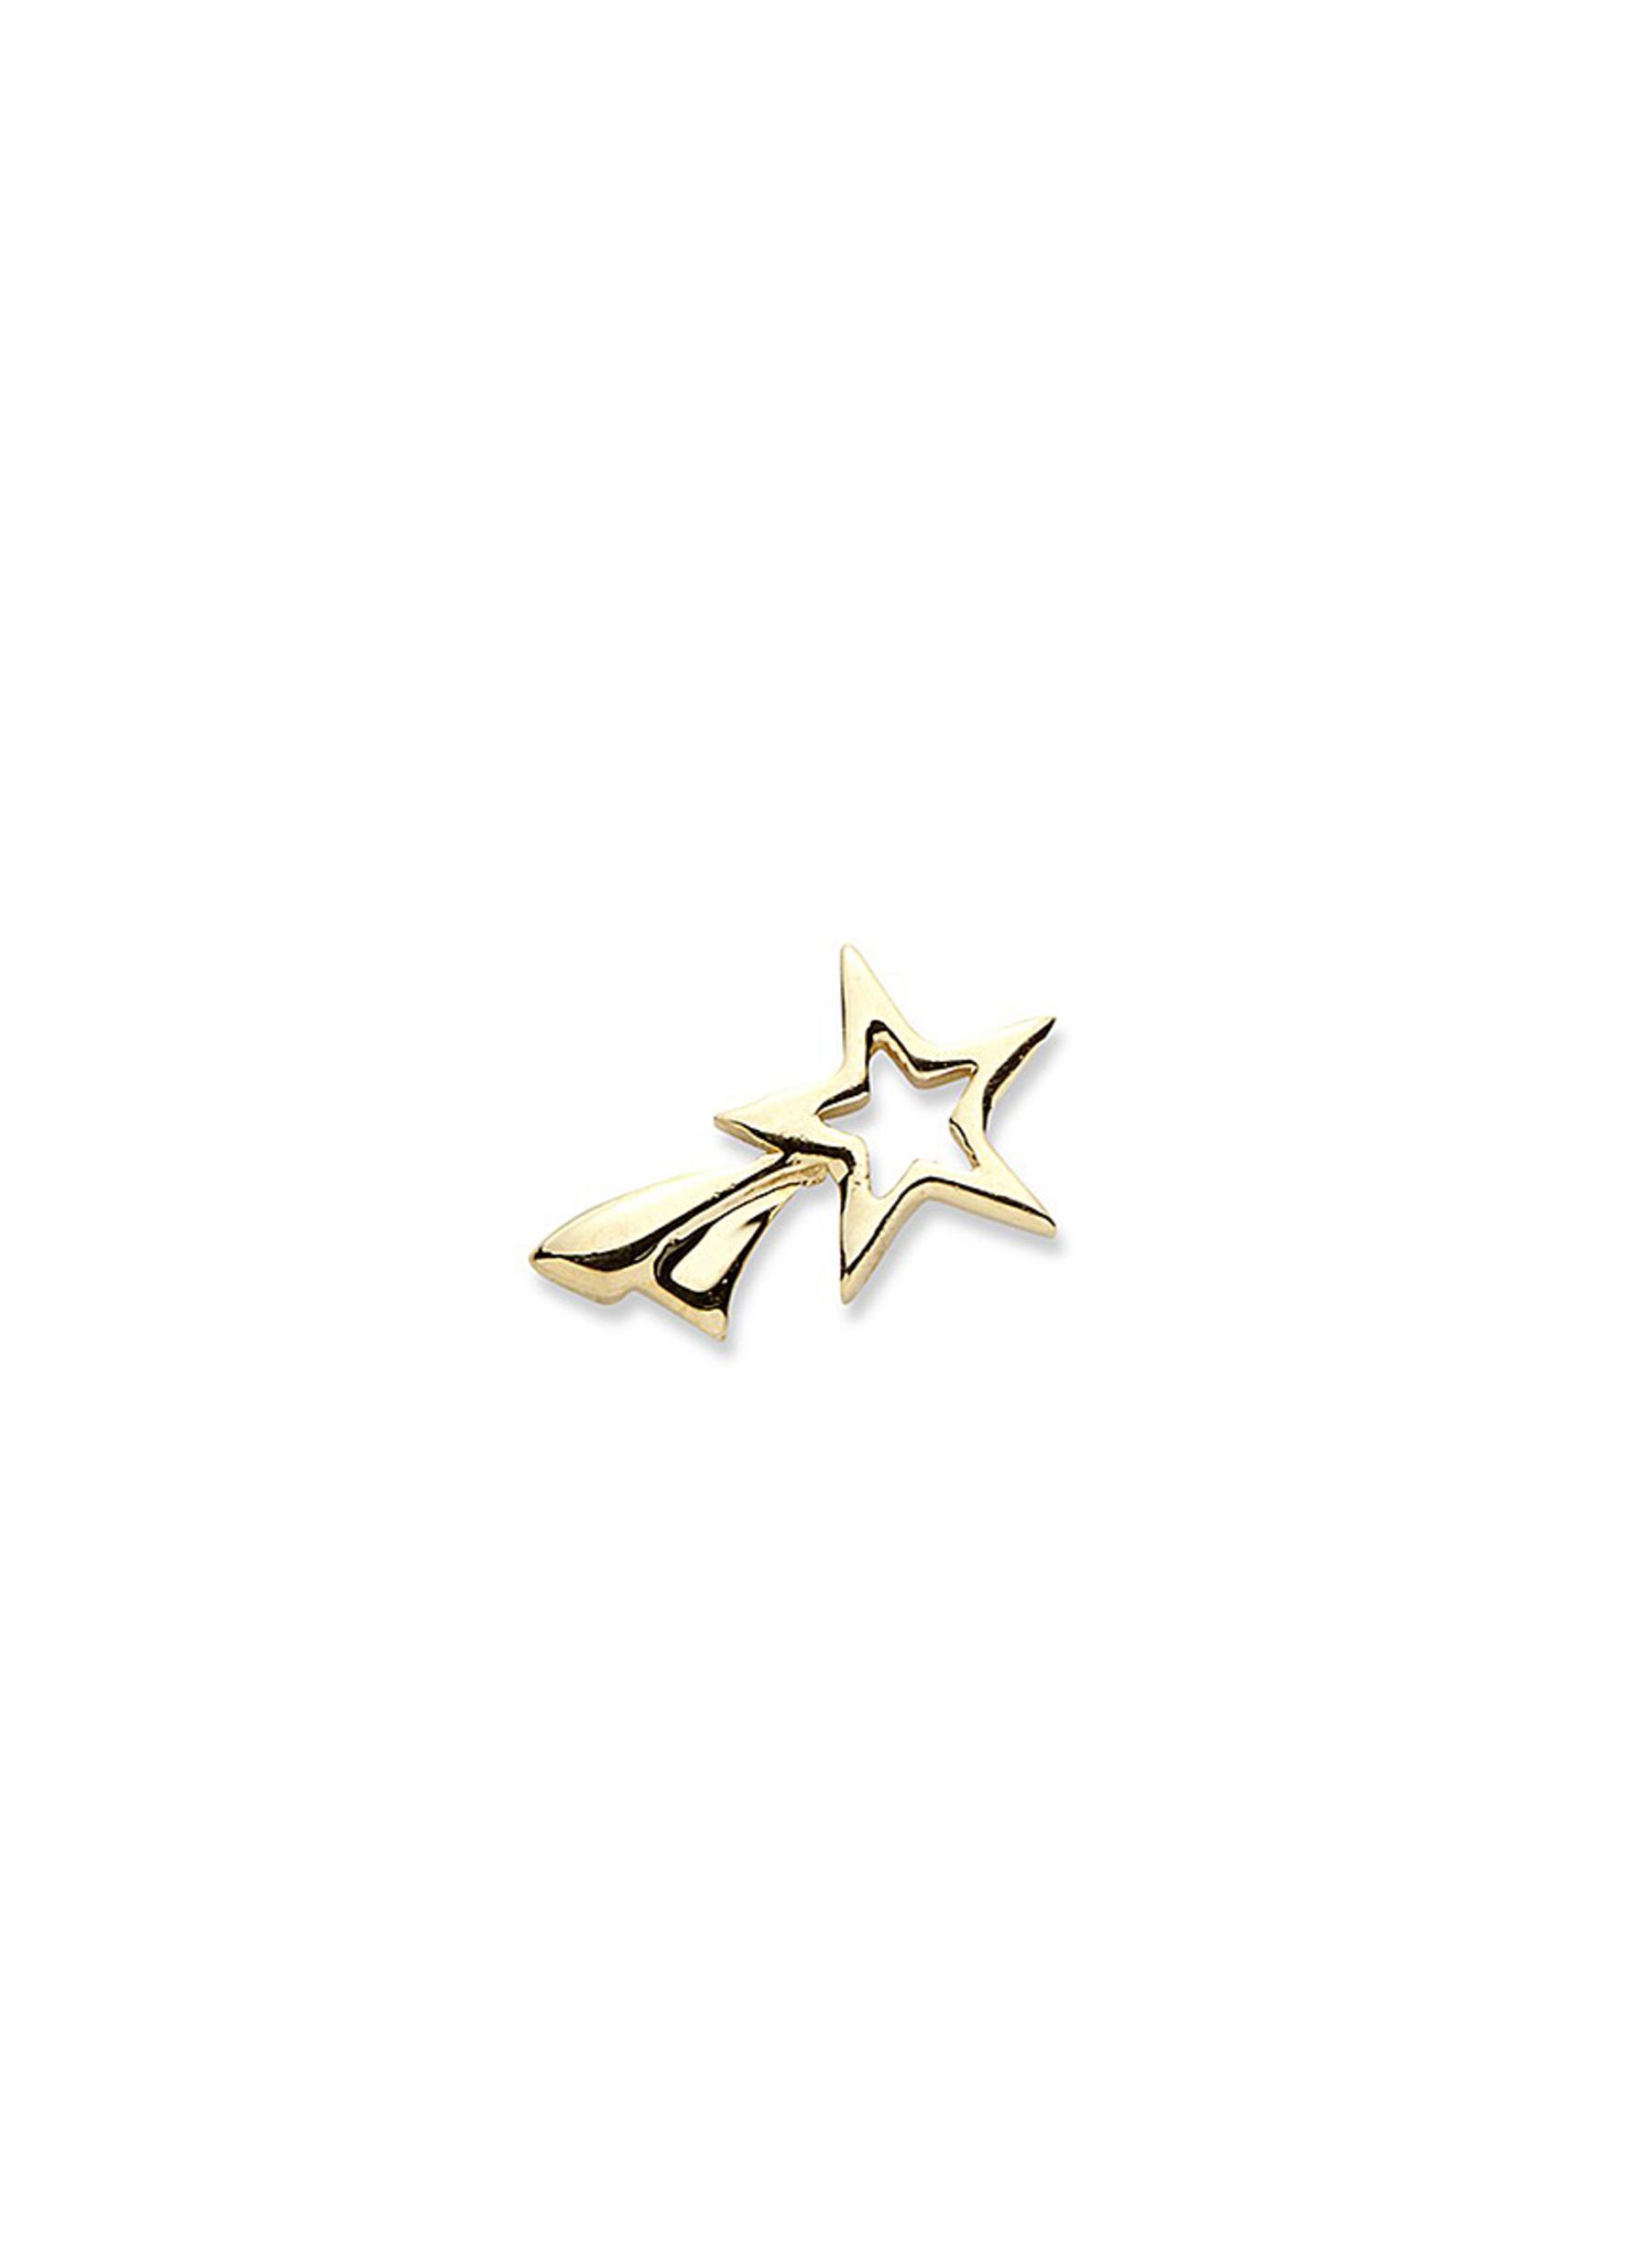 LOQUET LONDON 14K Yellow Gold Shooting Star Single Earring - Make A Wish